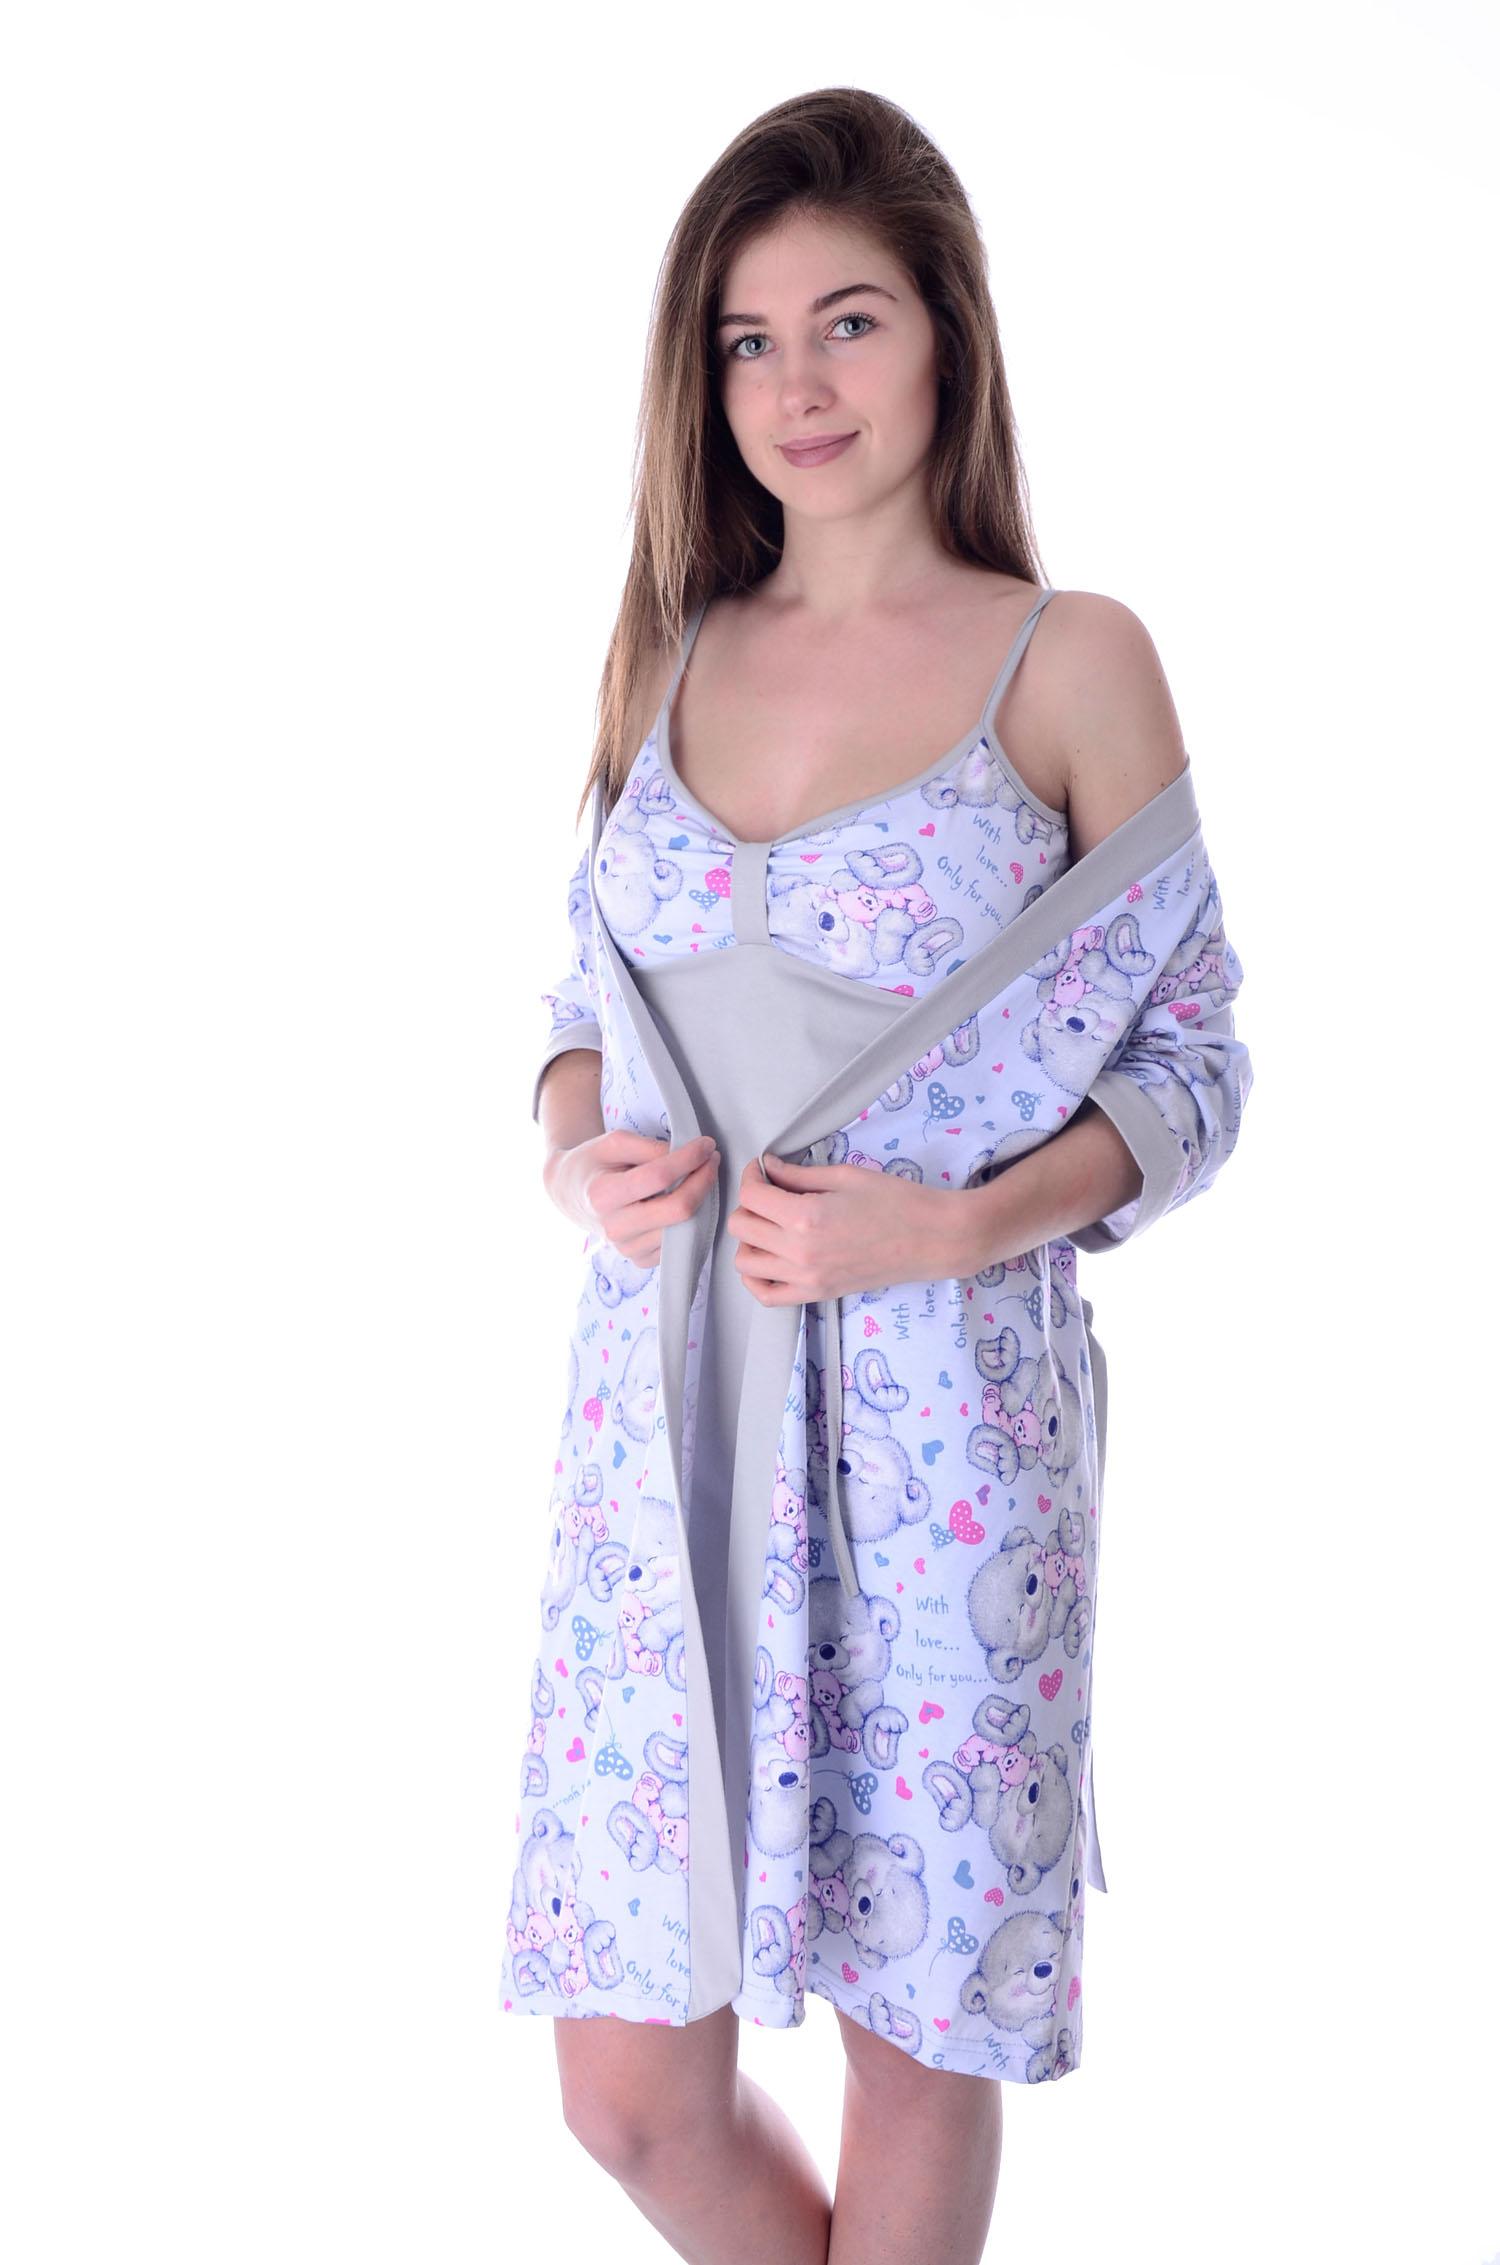 8a21a6fd3ab80 Халаты фланелевые, рубашки, пижамы фланелевые оптом от производителя ...